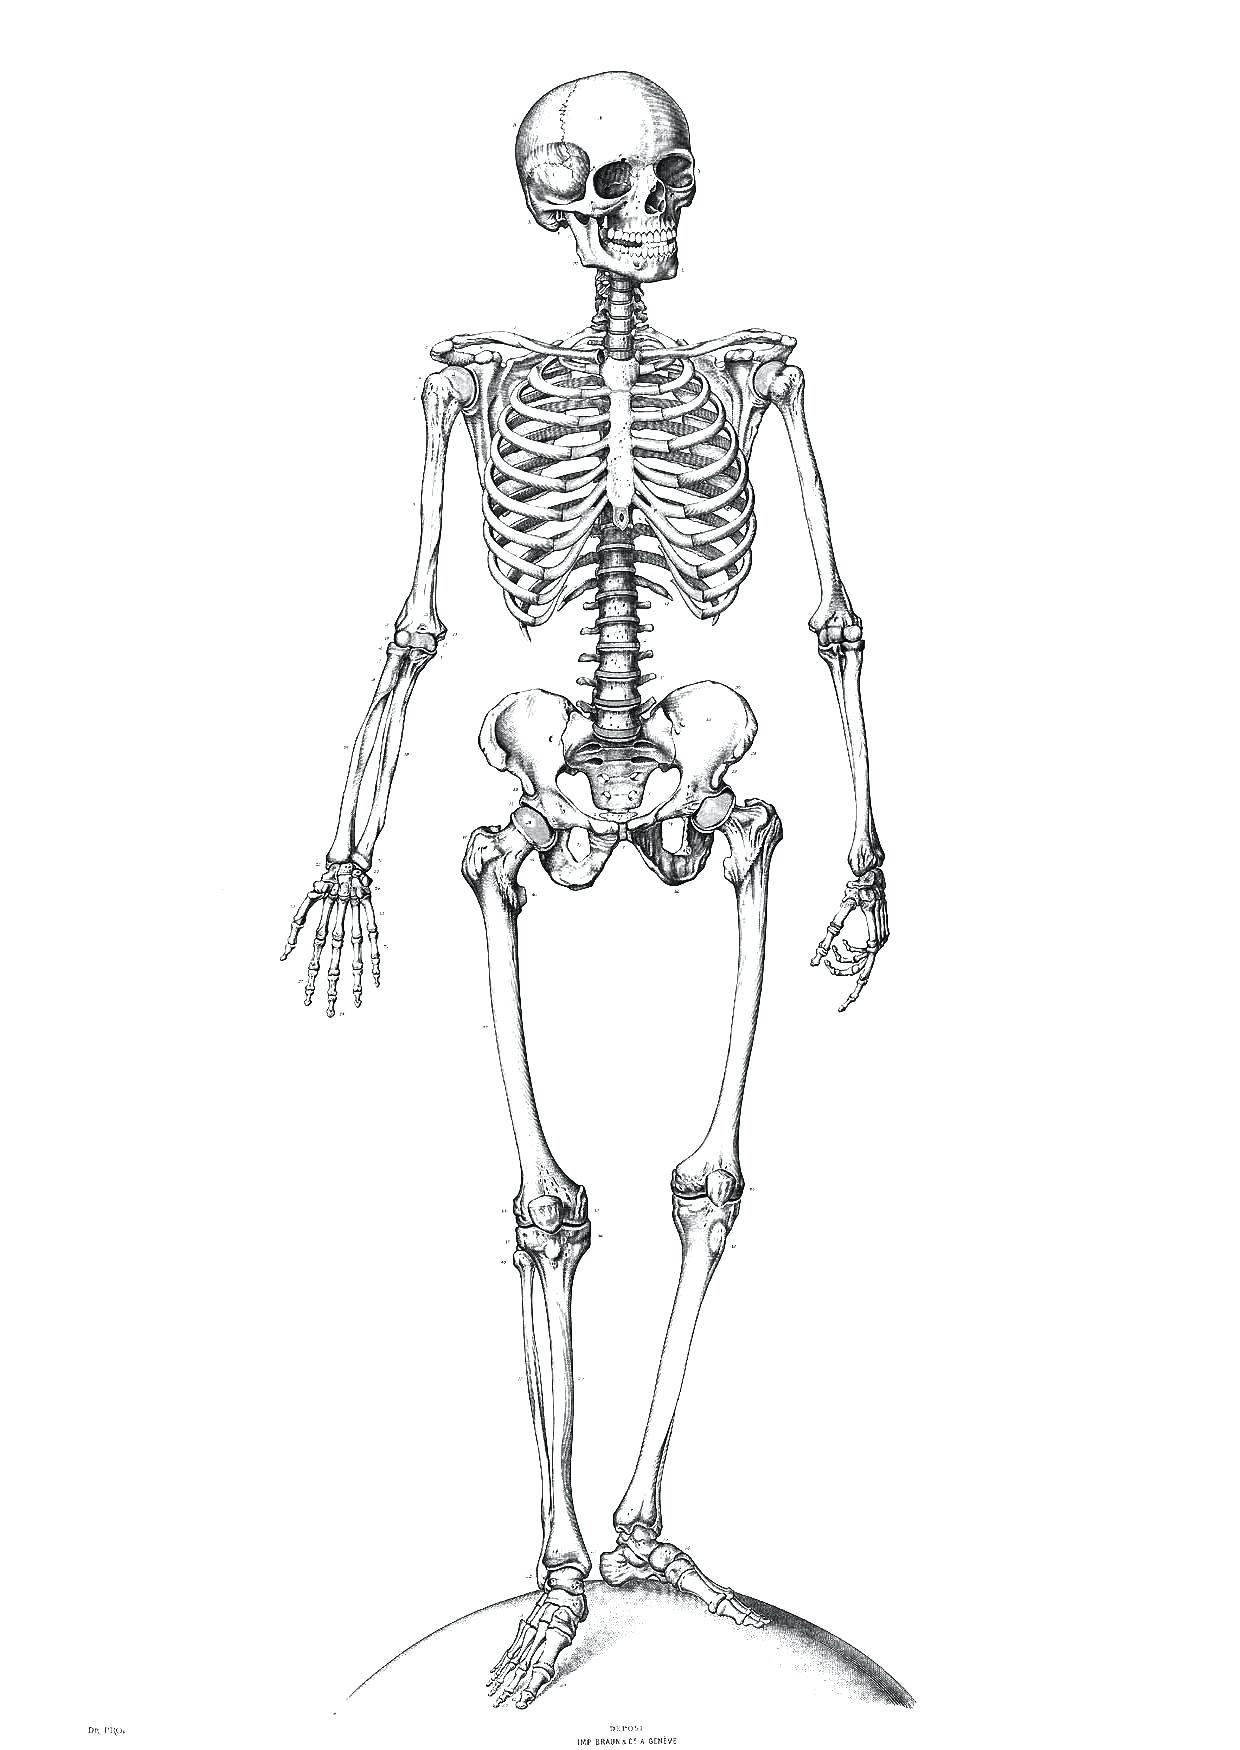 the human skeleton diagram fill in blanks tekonsha voyager 9030 wiring unlabeled of anatomy drawing